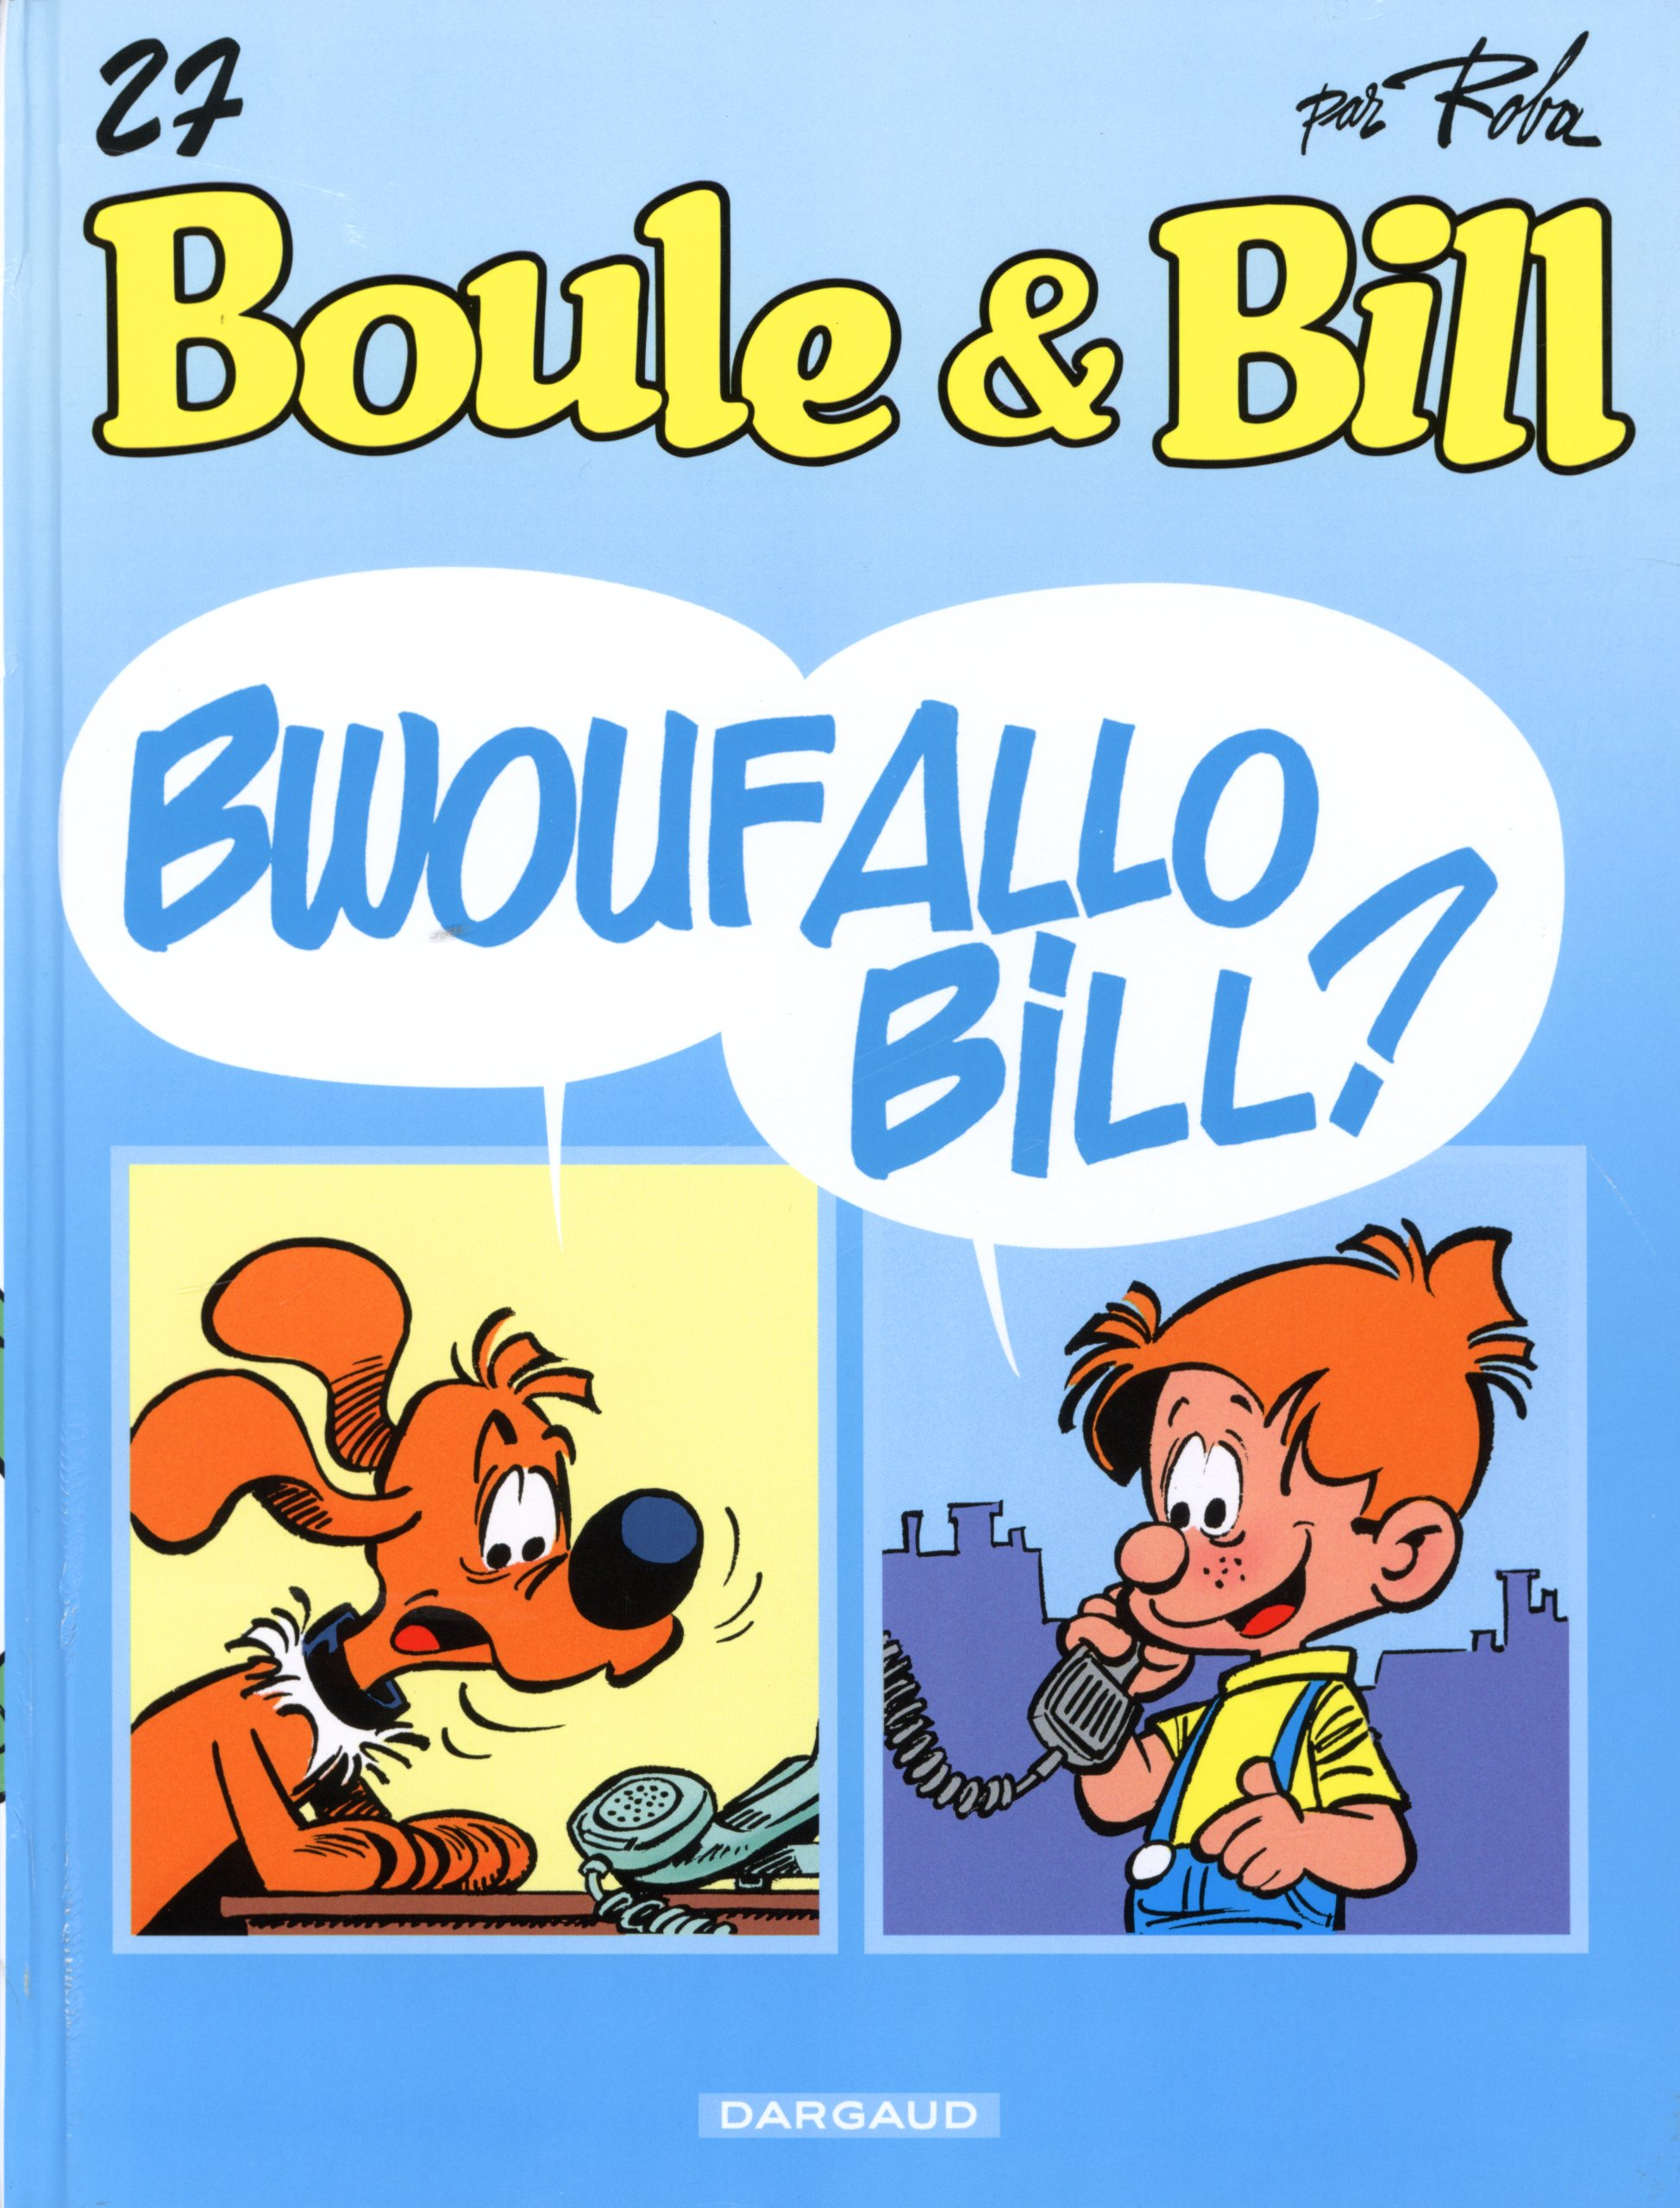 Bwoufallo Bill?